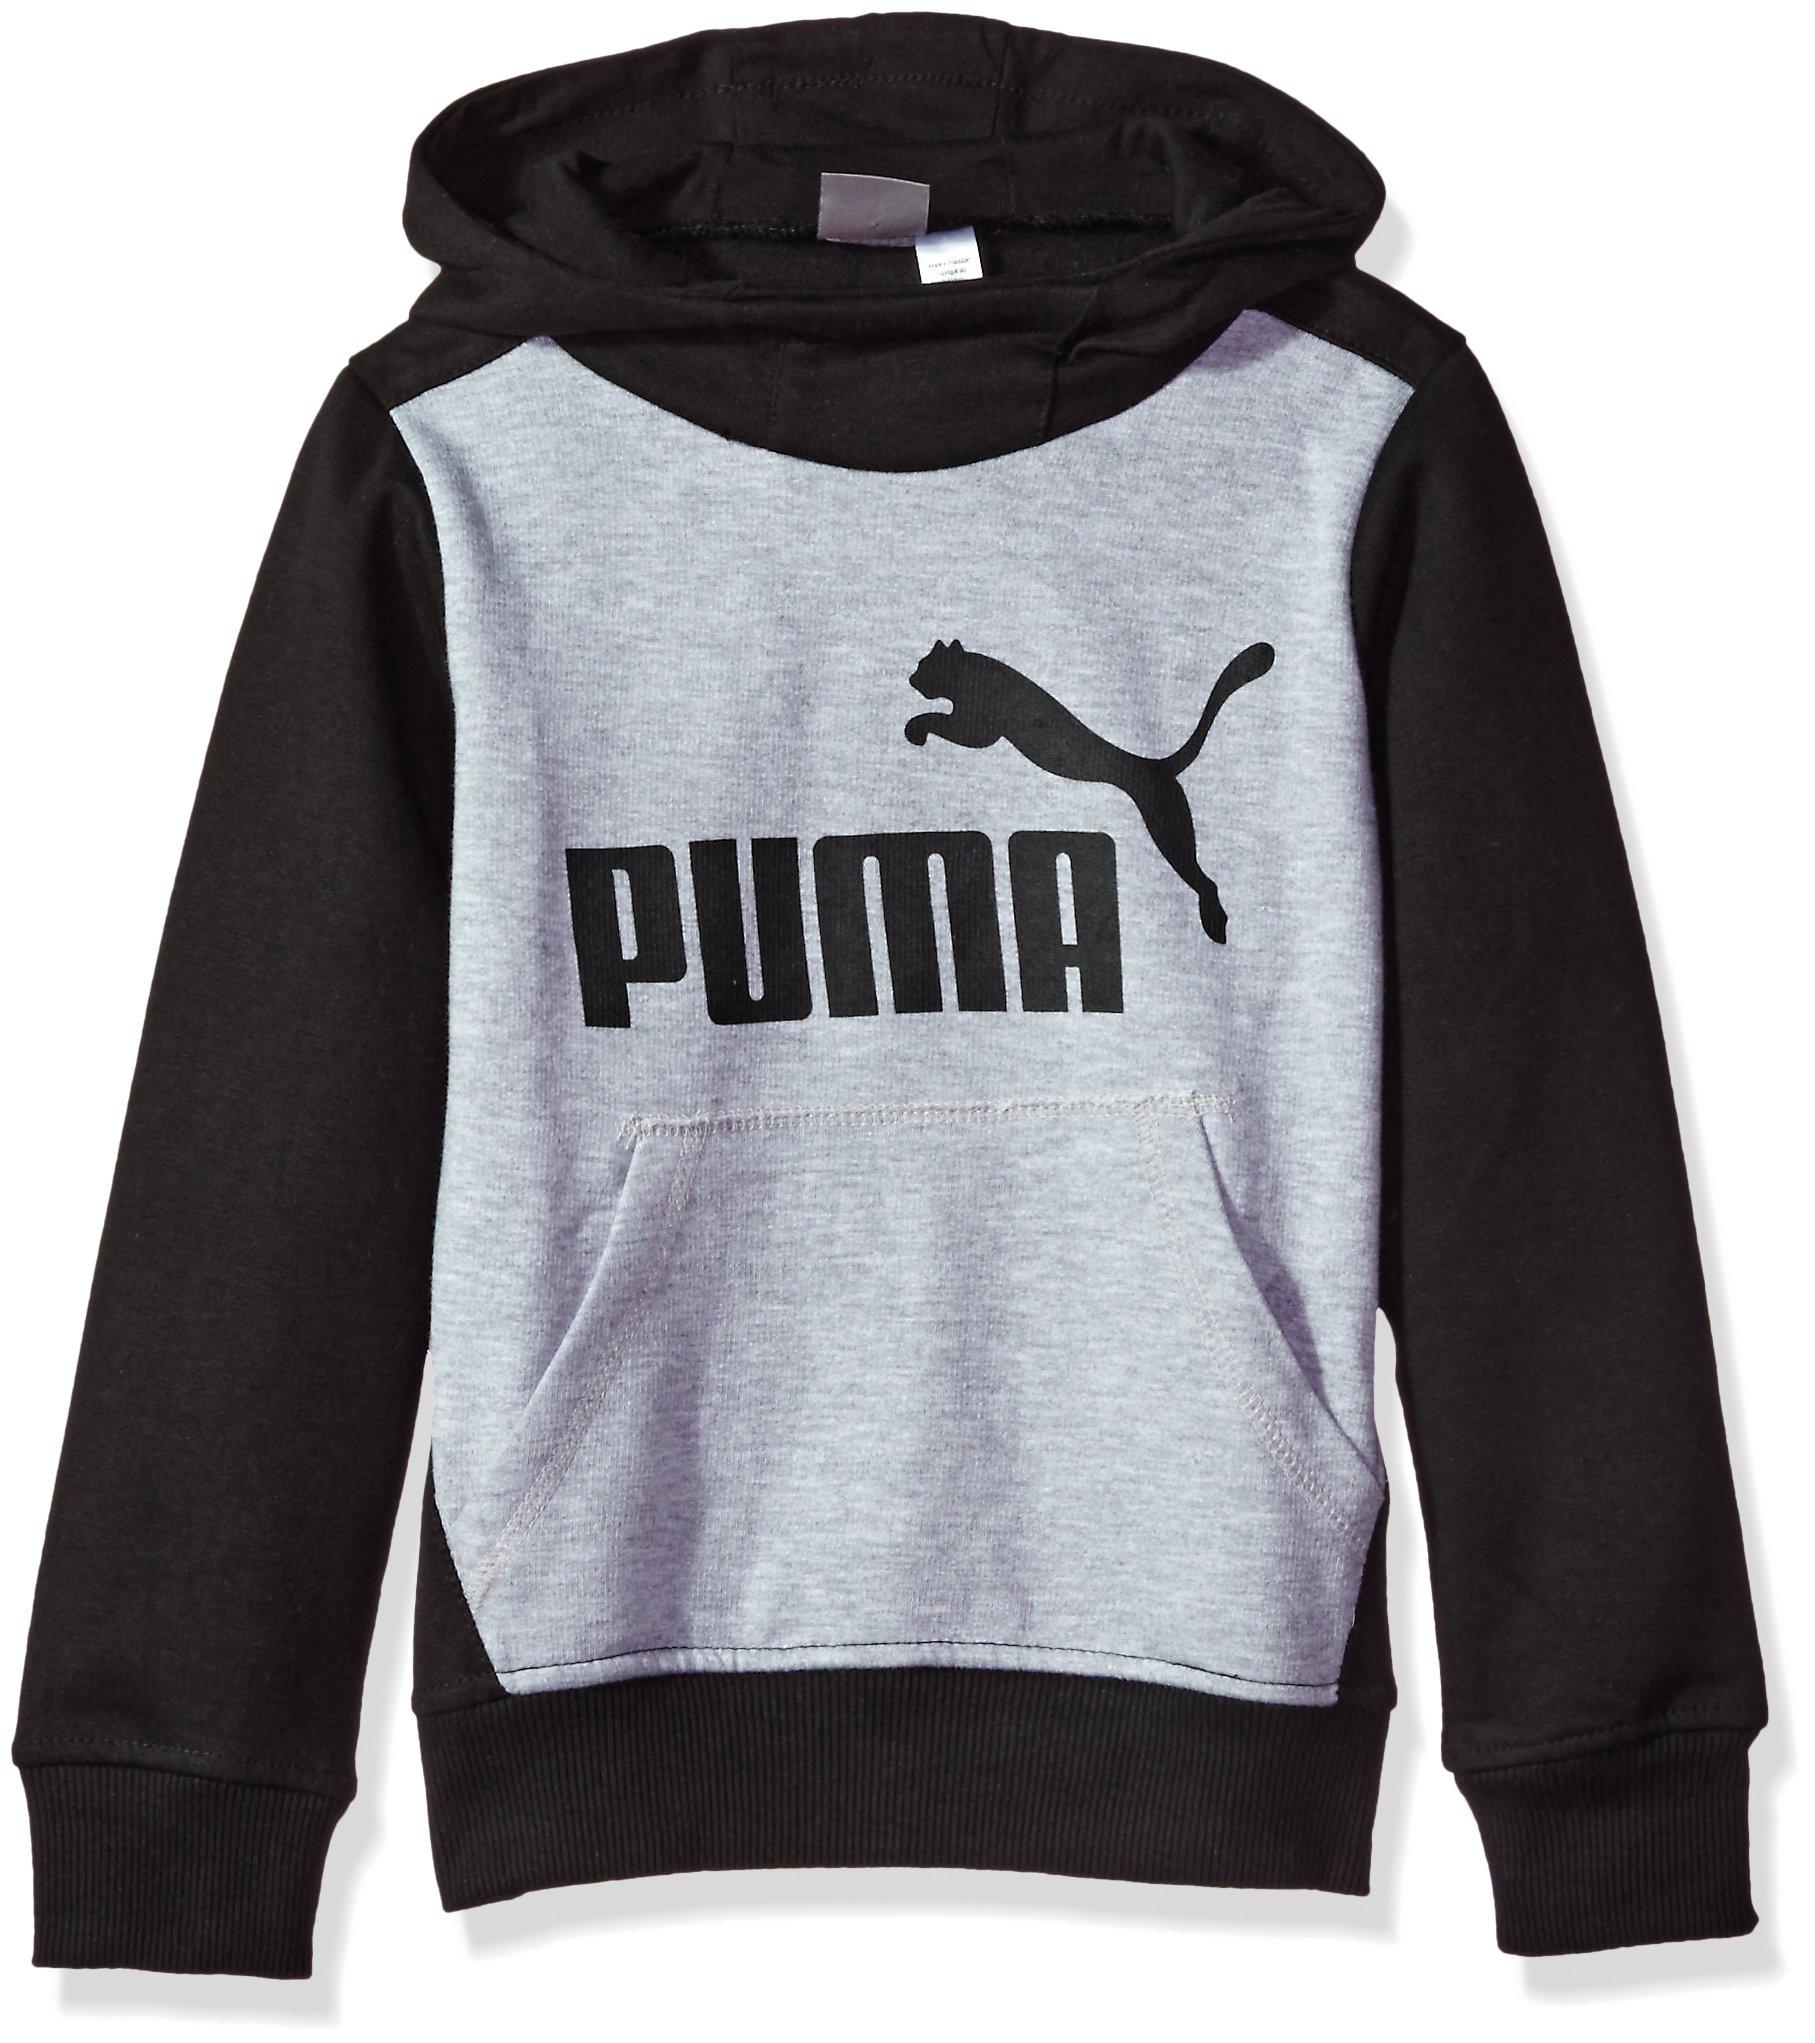 PUMA Little Boys' Pullover Hoodie, Light Heather Grey, 6